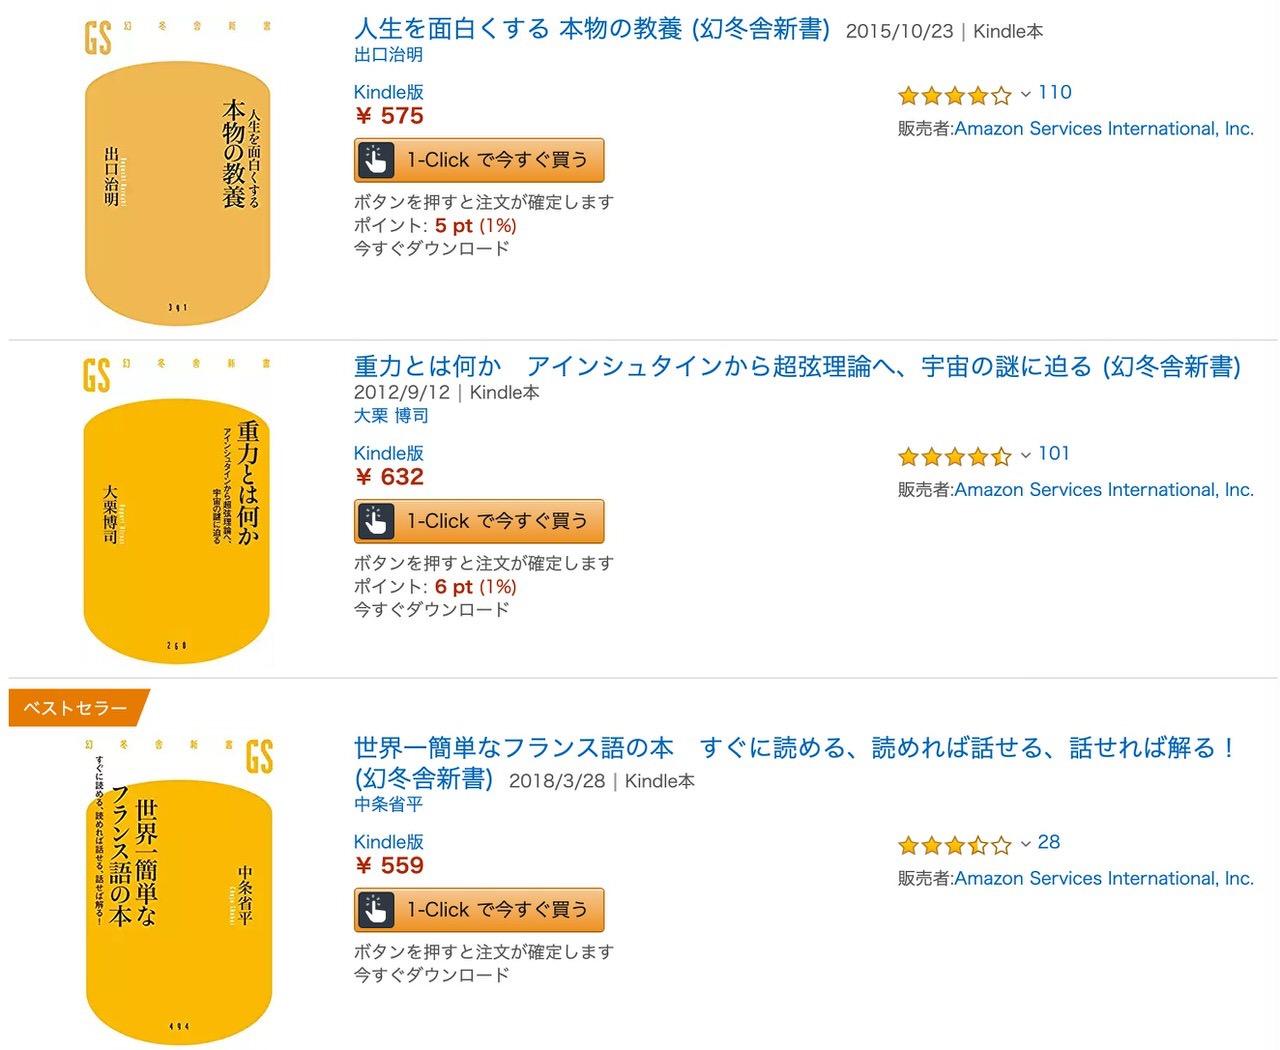 【Kindleセール】30%オフ「知っておくべき大人の教養フェア」(5/30まで)